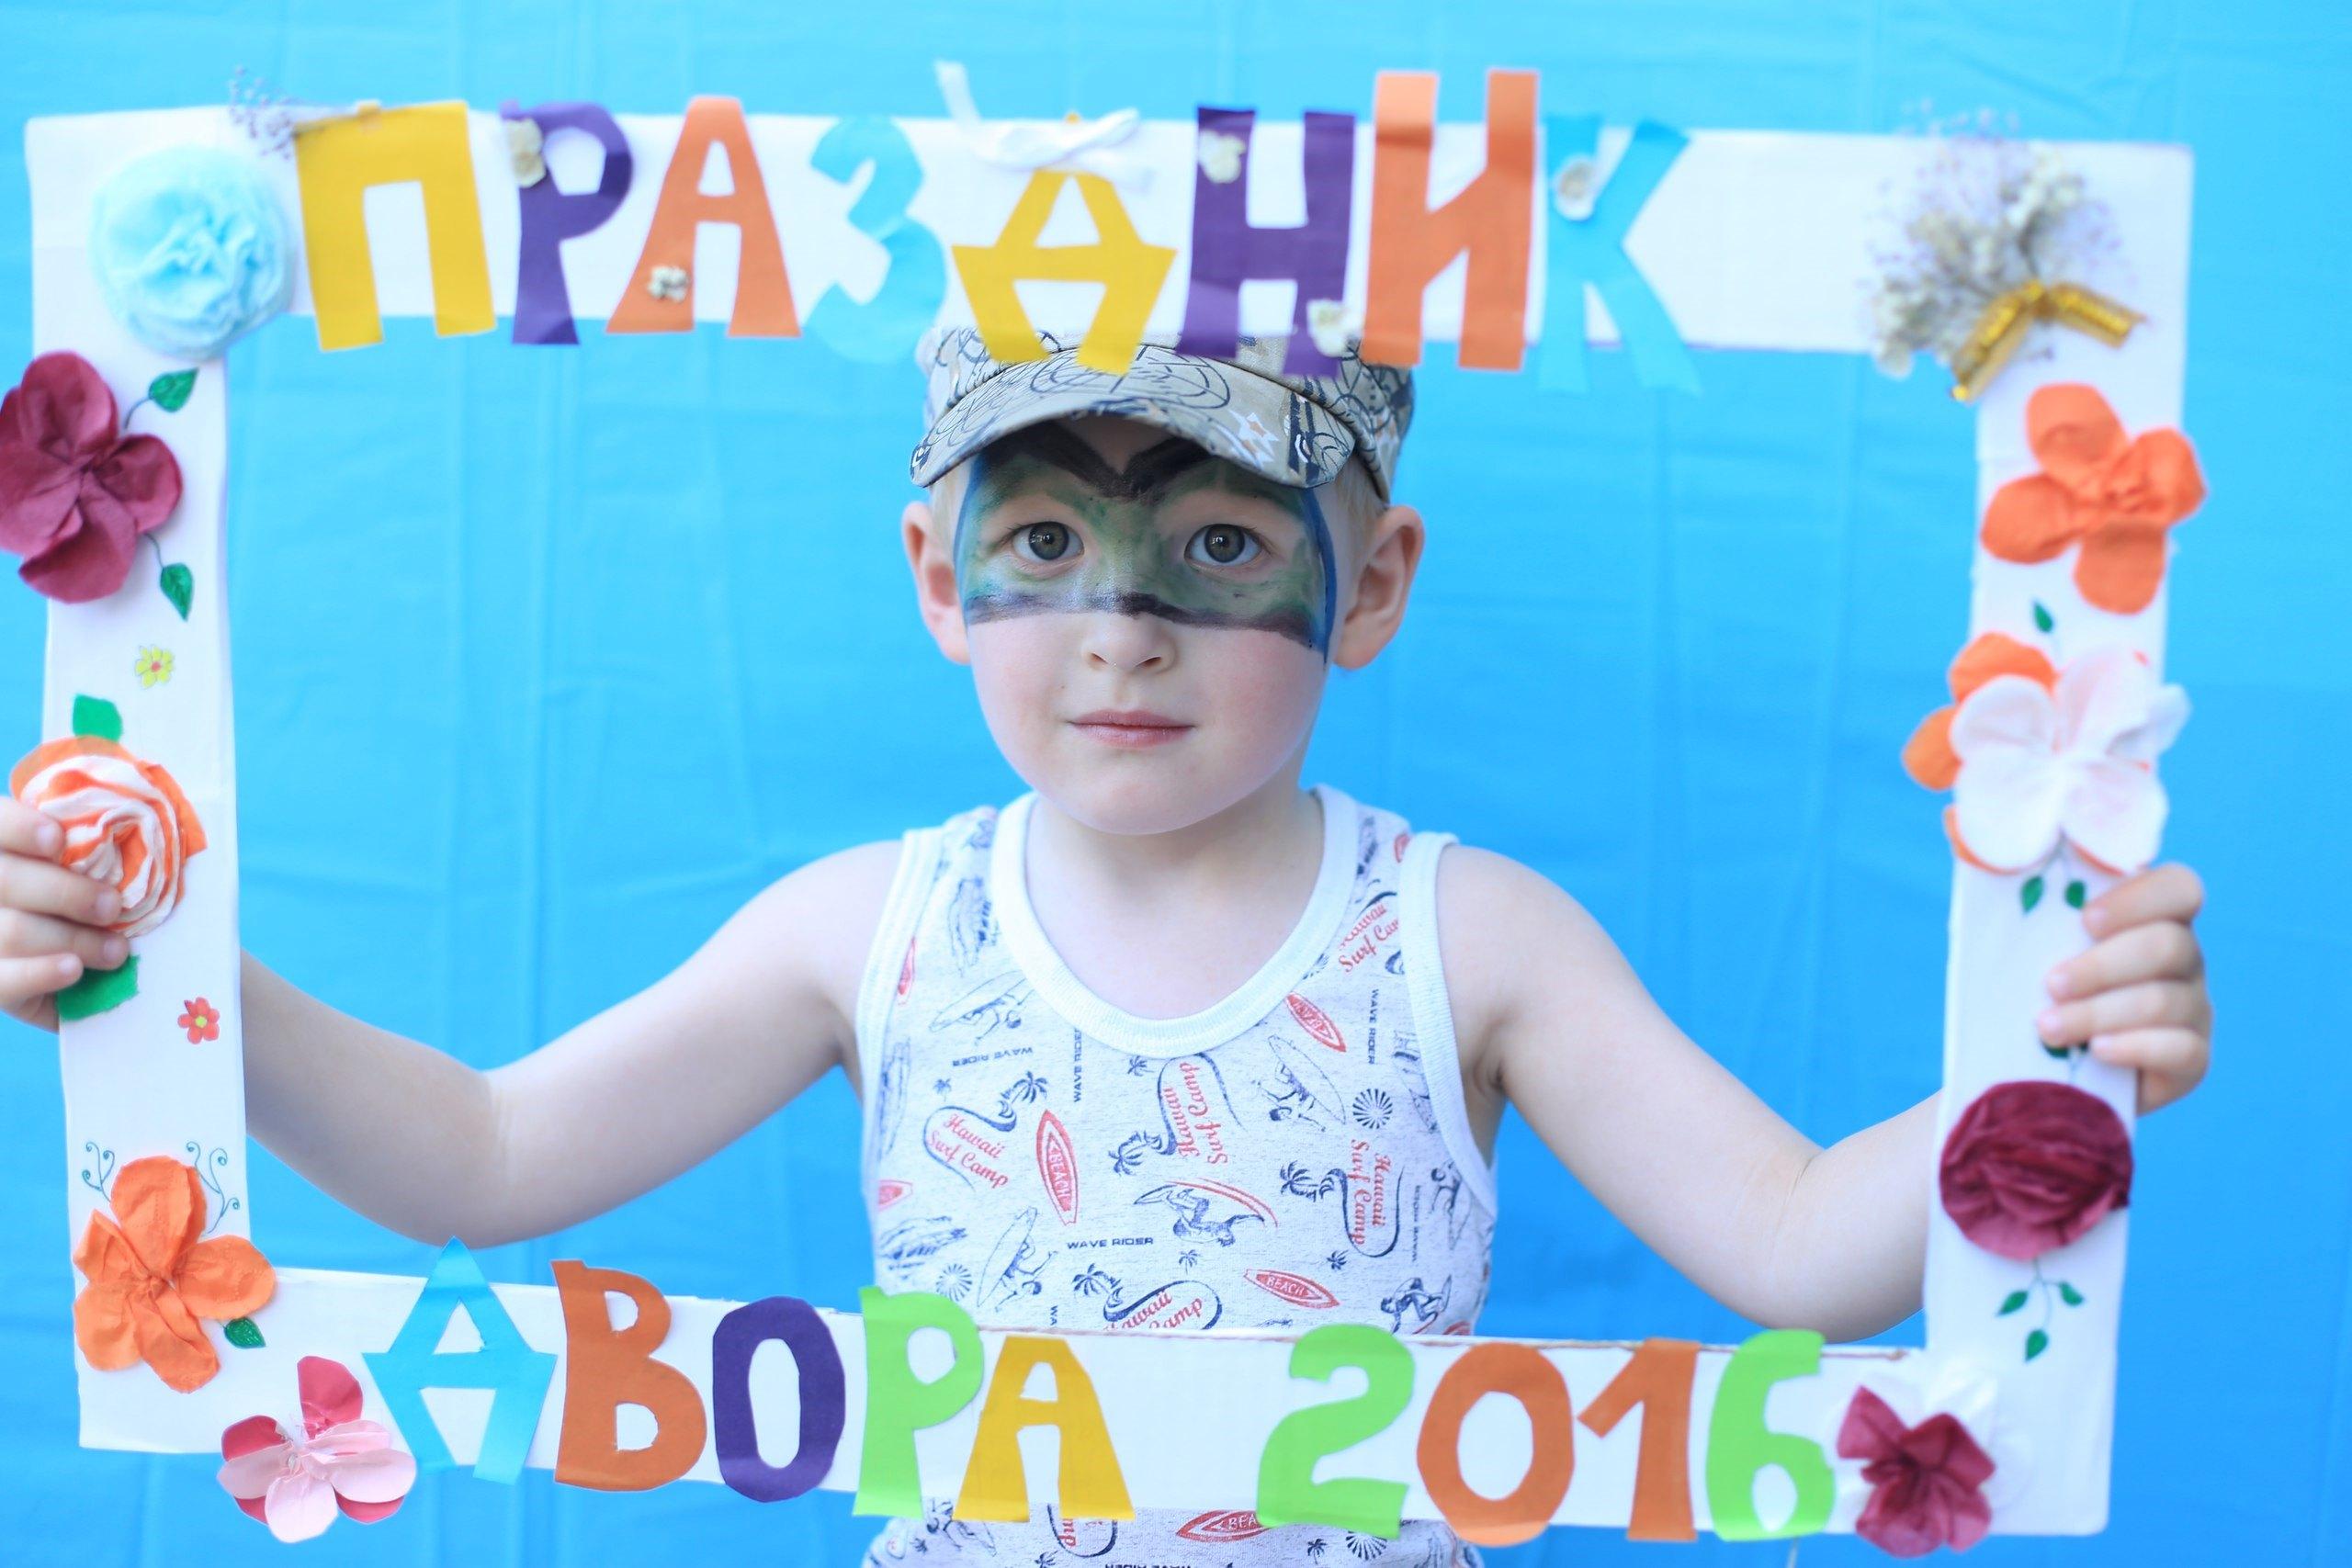 25.06.2016, праздник двора, 37